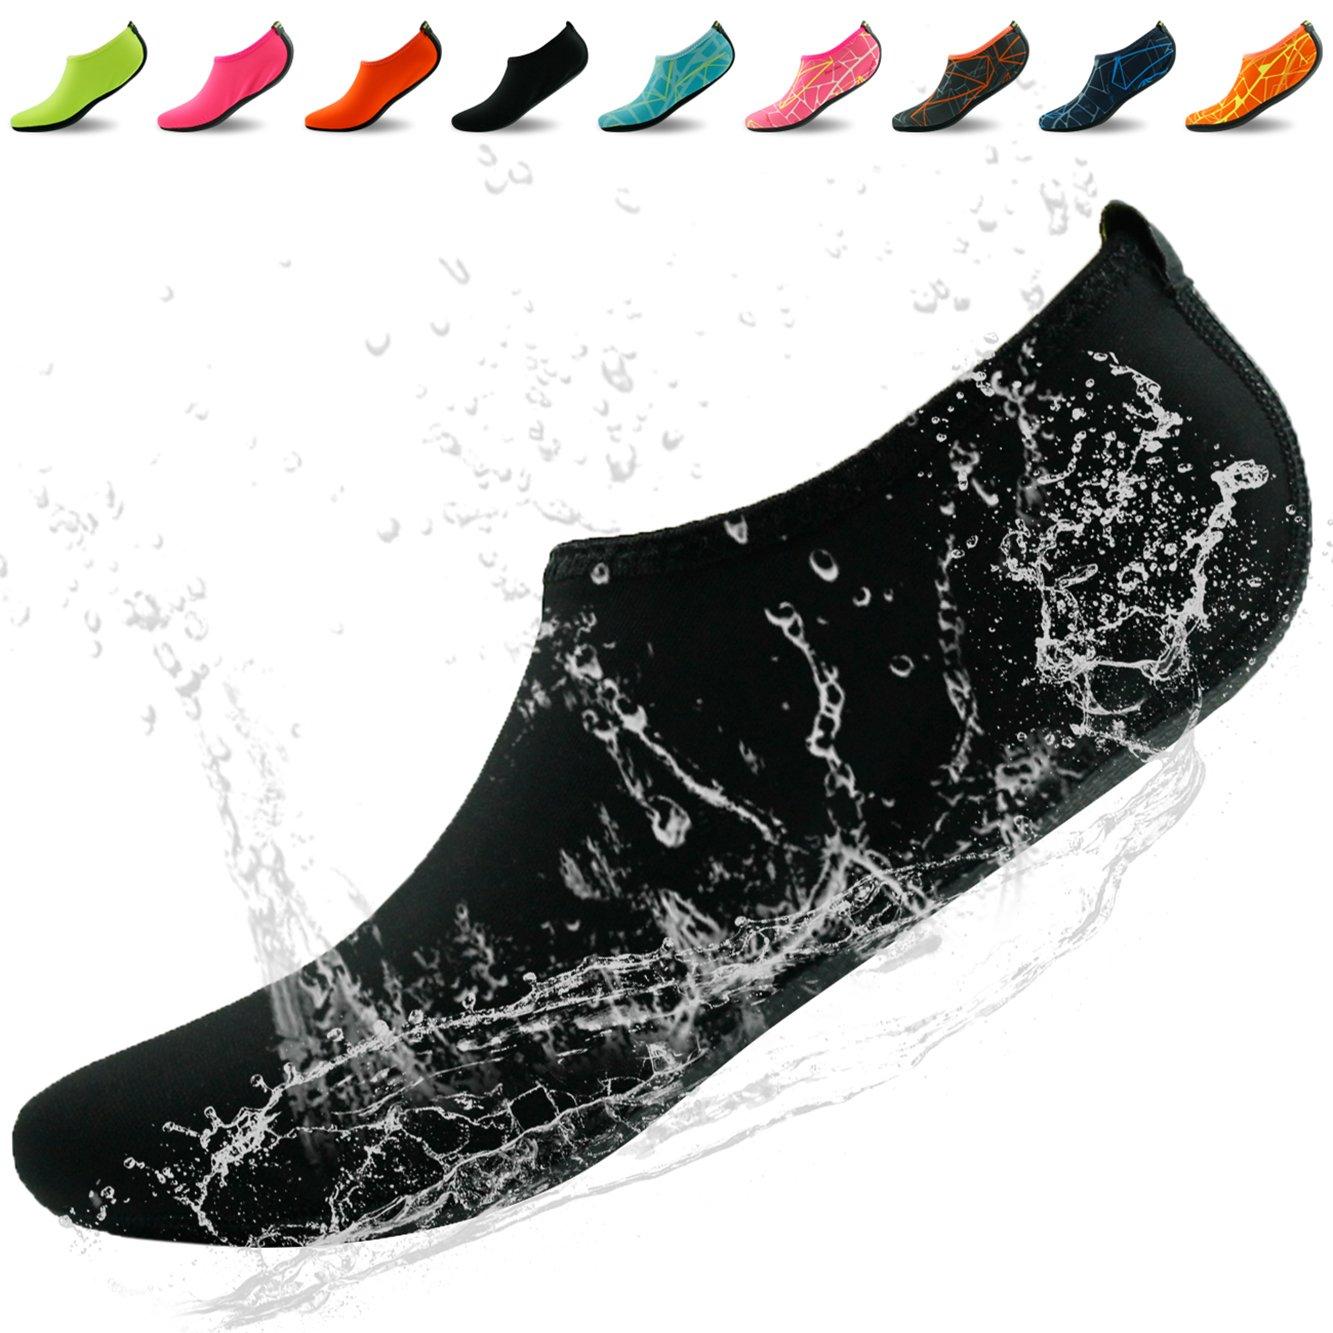 Home Slipper Unisex Summer Barefoot Quick-Dry Water Sports Shoes Aqua Socks for Beach Swim Surf Yoga Exercise